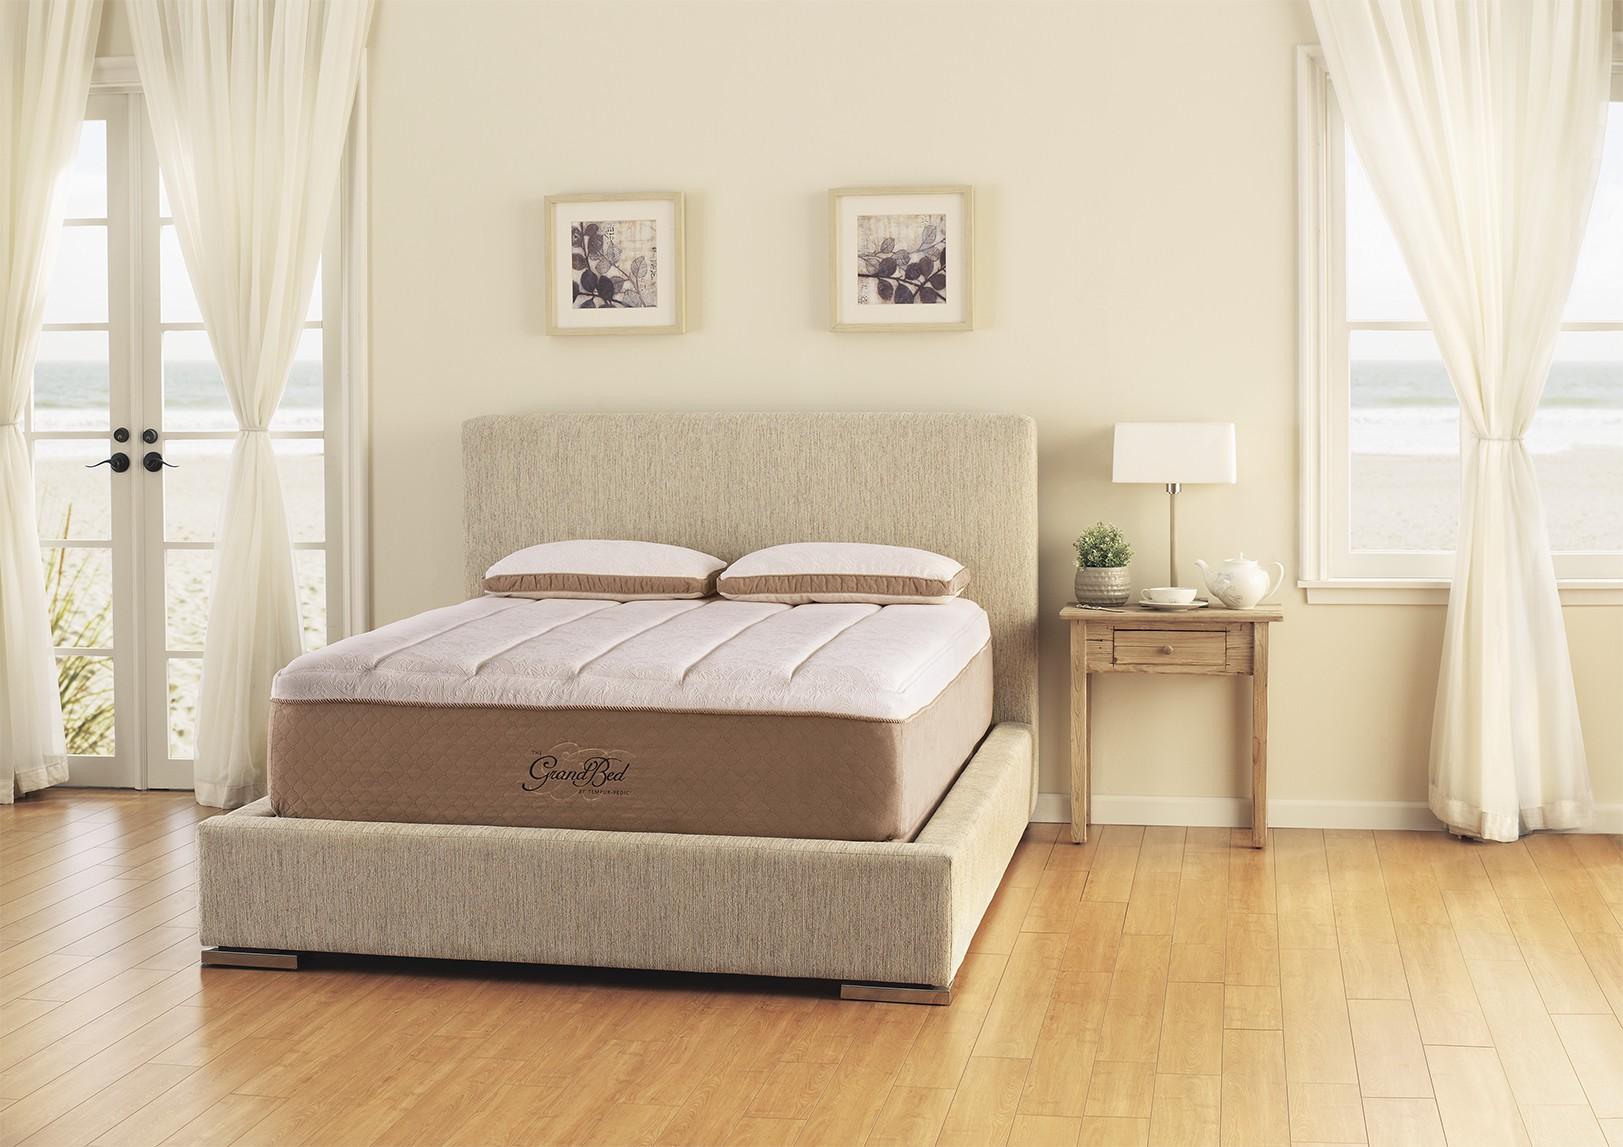 grandbed by tempur pedic tempur pedic. Black Bedroom Furniture Sets. Home Design Ideas